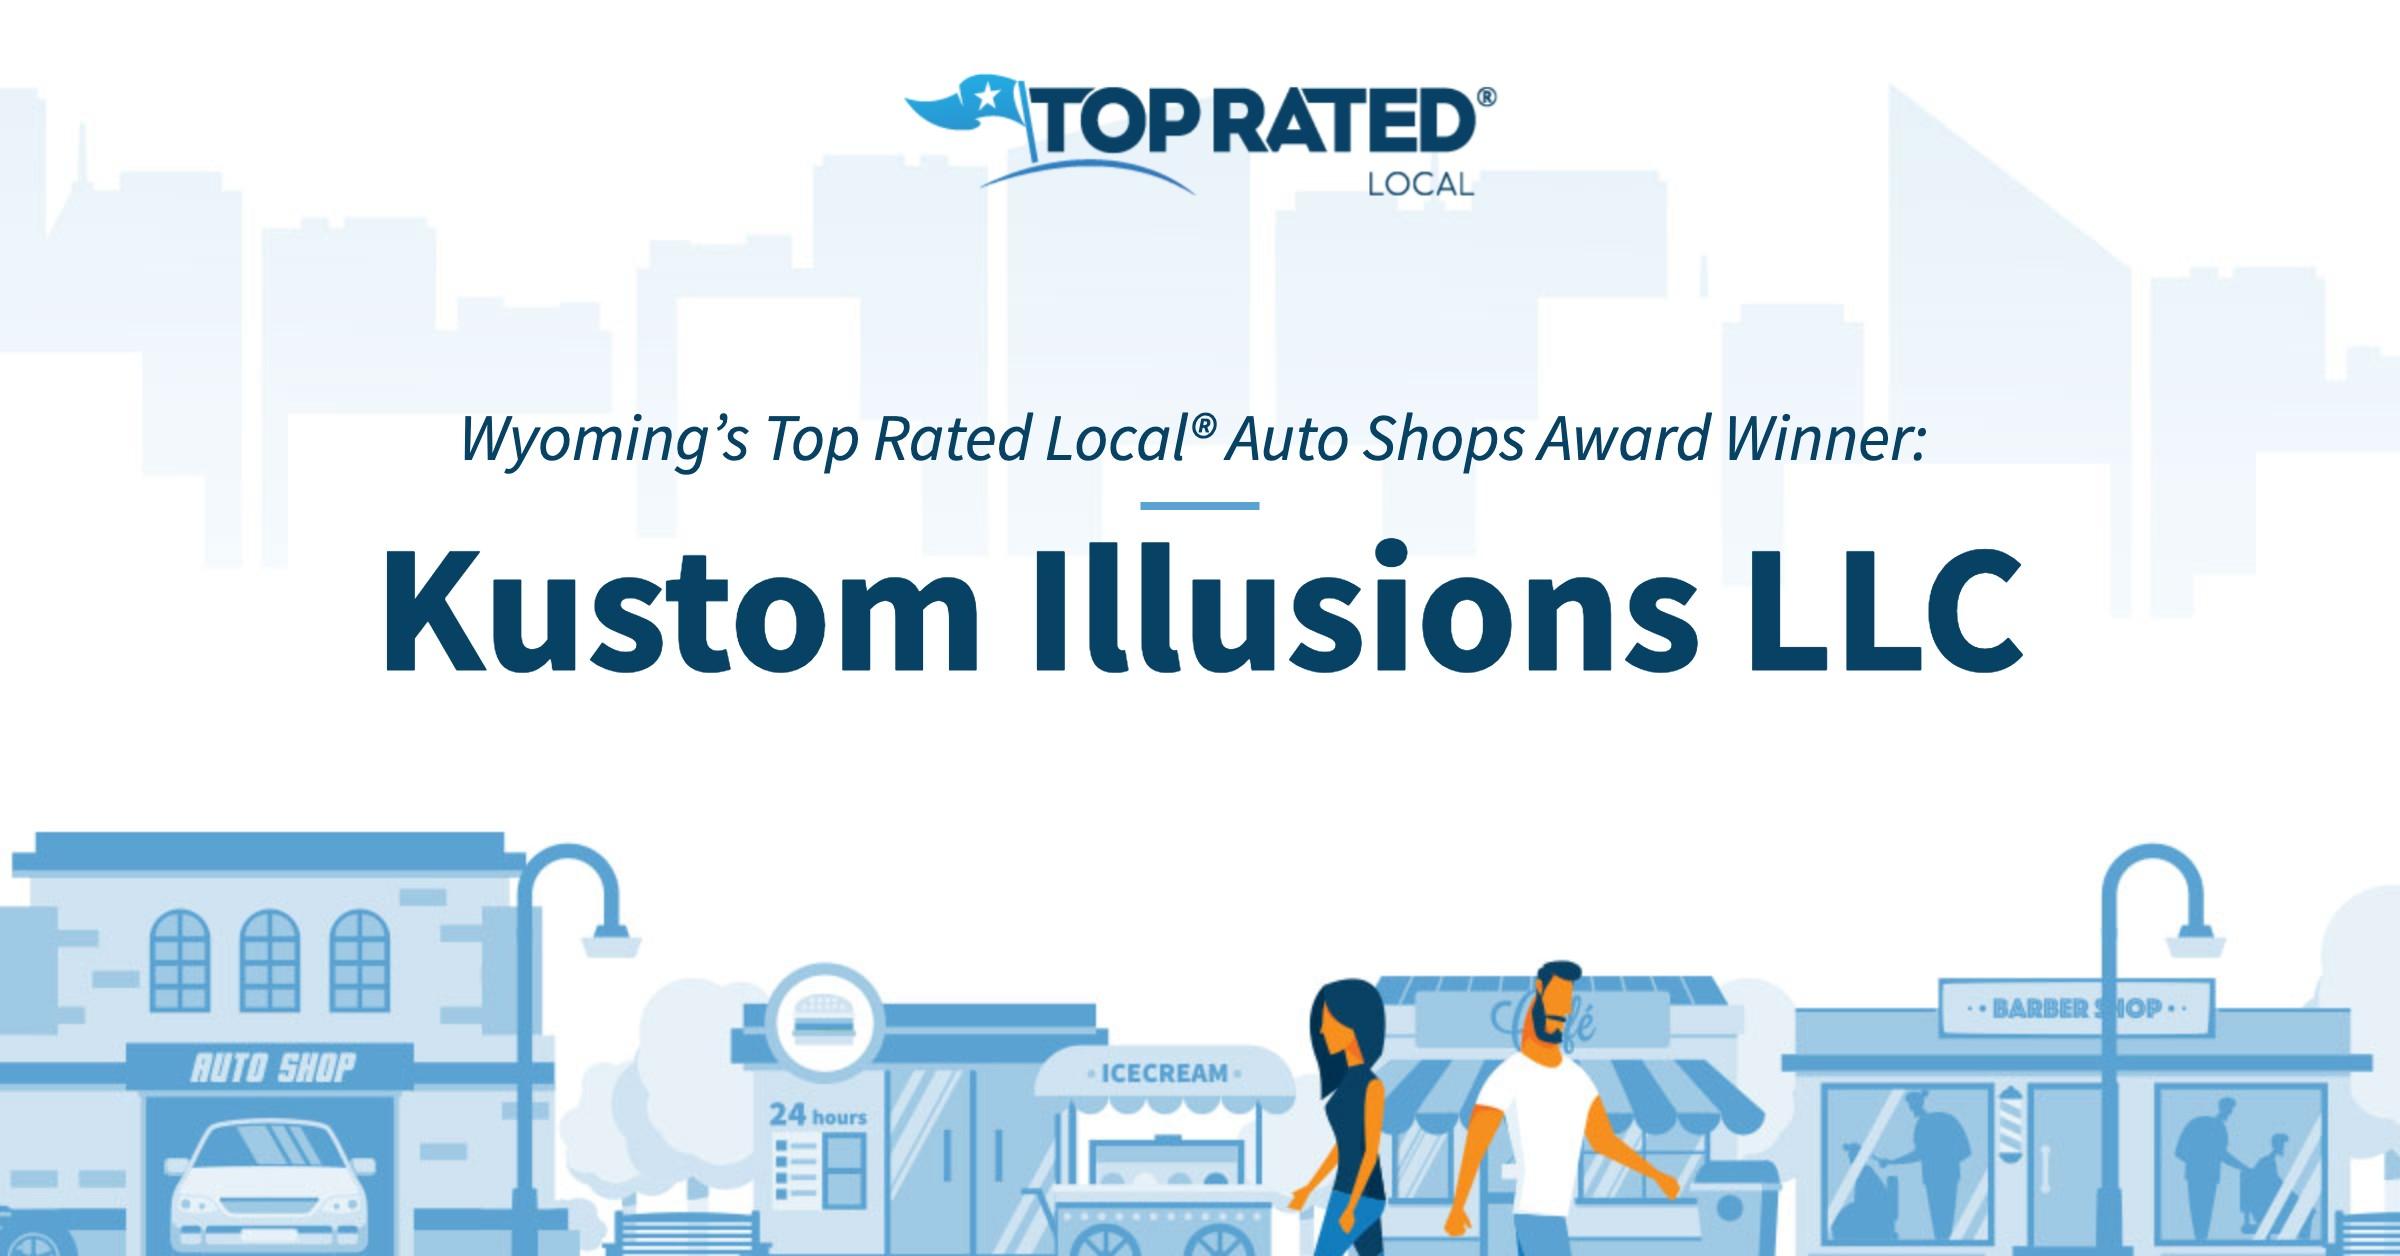 Wyoming's Top Rated Local® Auto Shops Award Winner: Kustom Illusions LLC